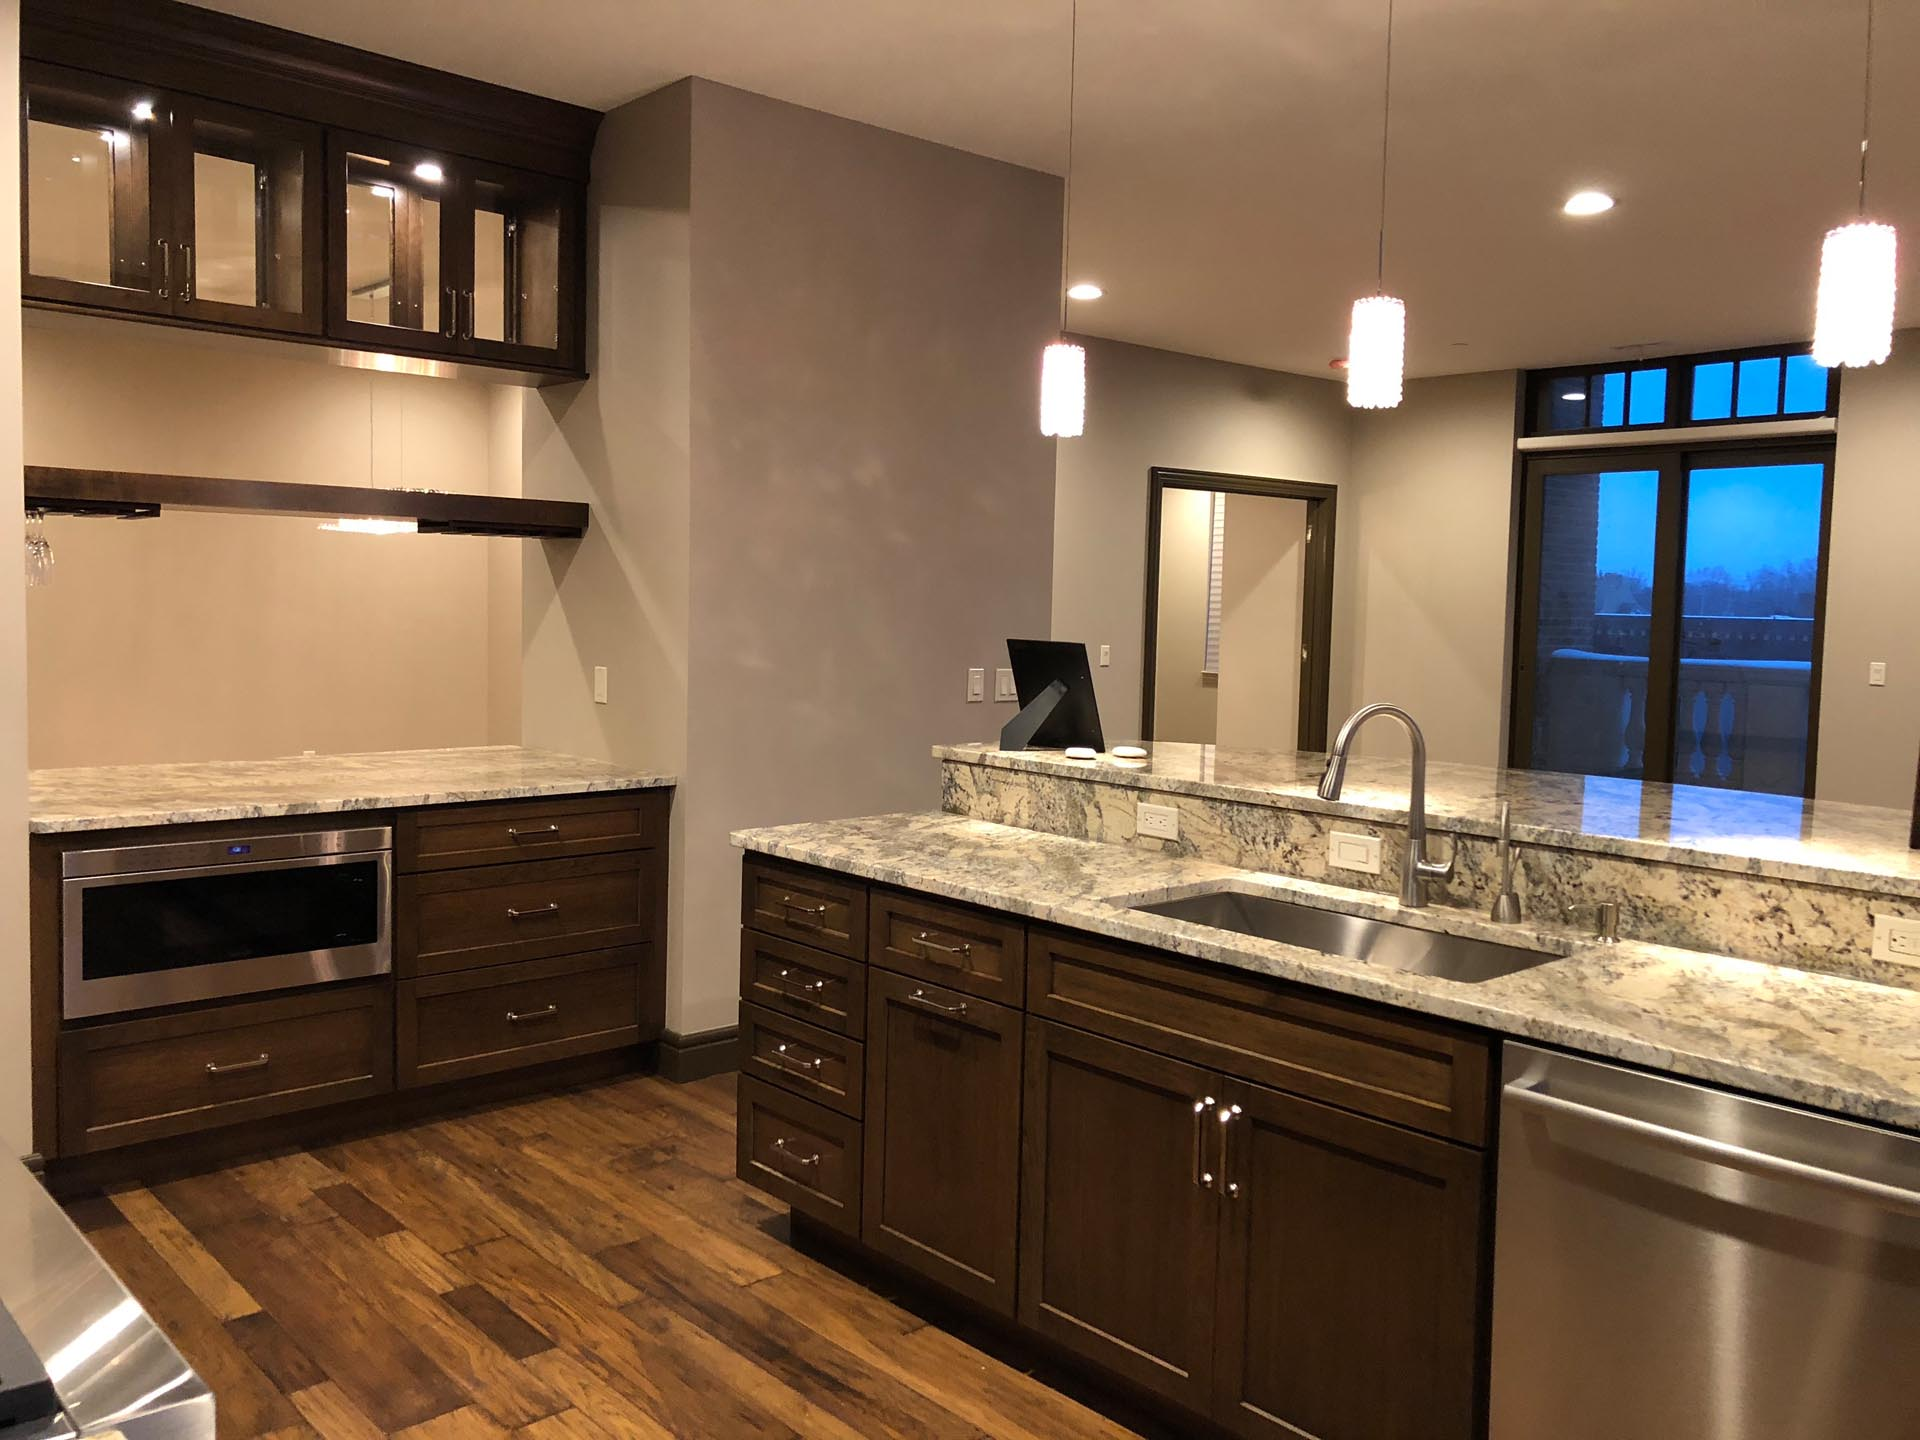 New Kitchen Design | H Residence | Midland, MI